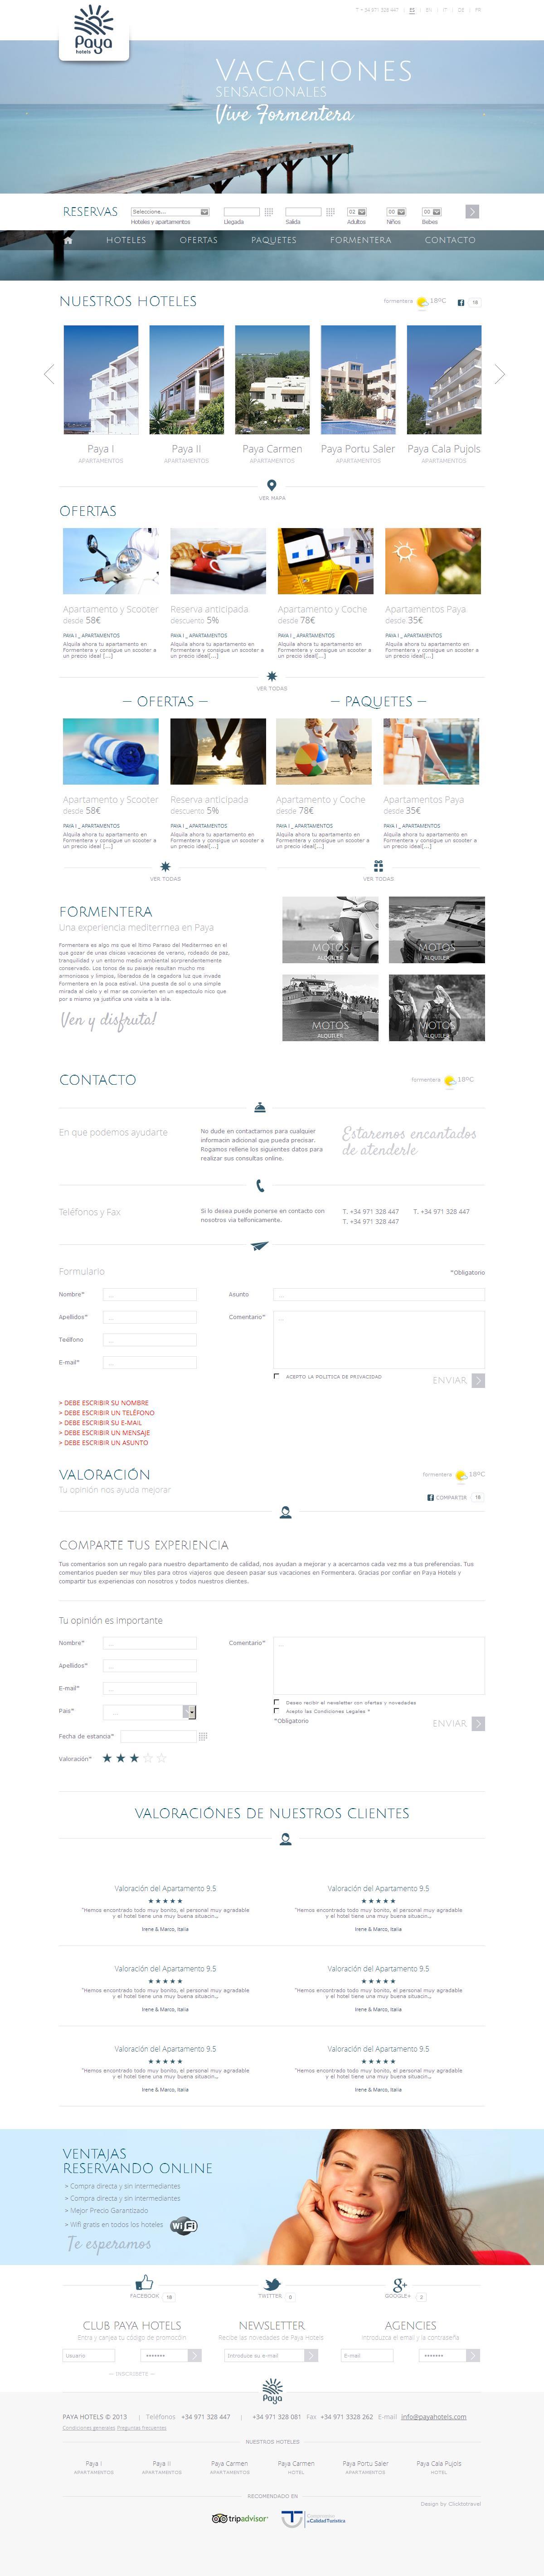 PSD to HTML - Paya Hotels